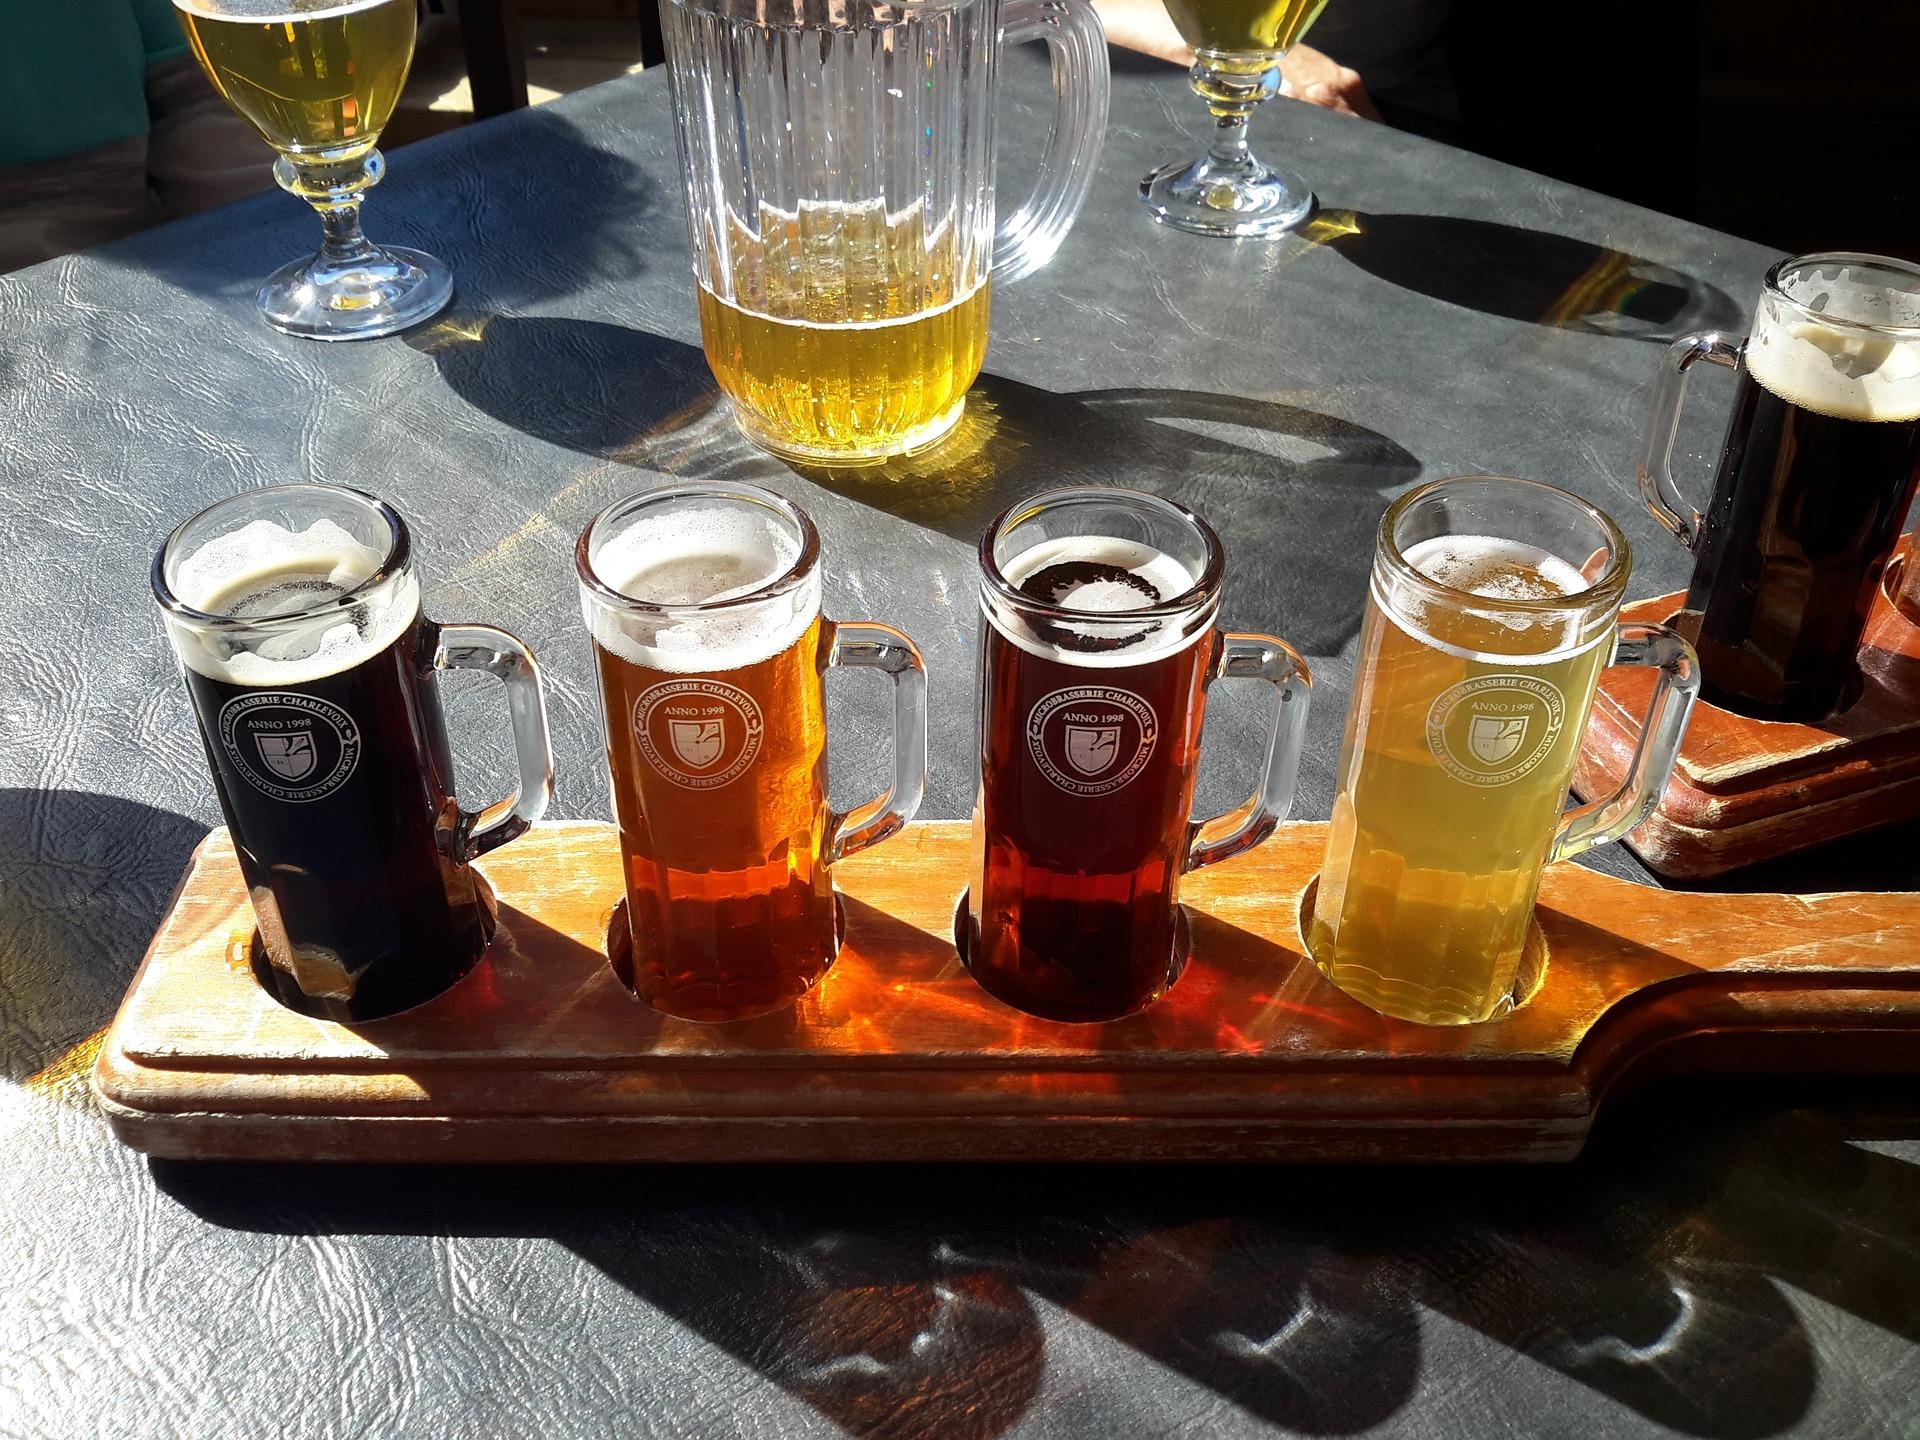 San Francisco International Beer Festival